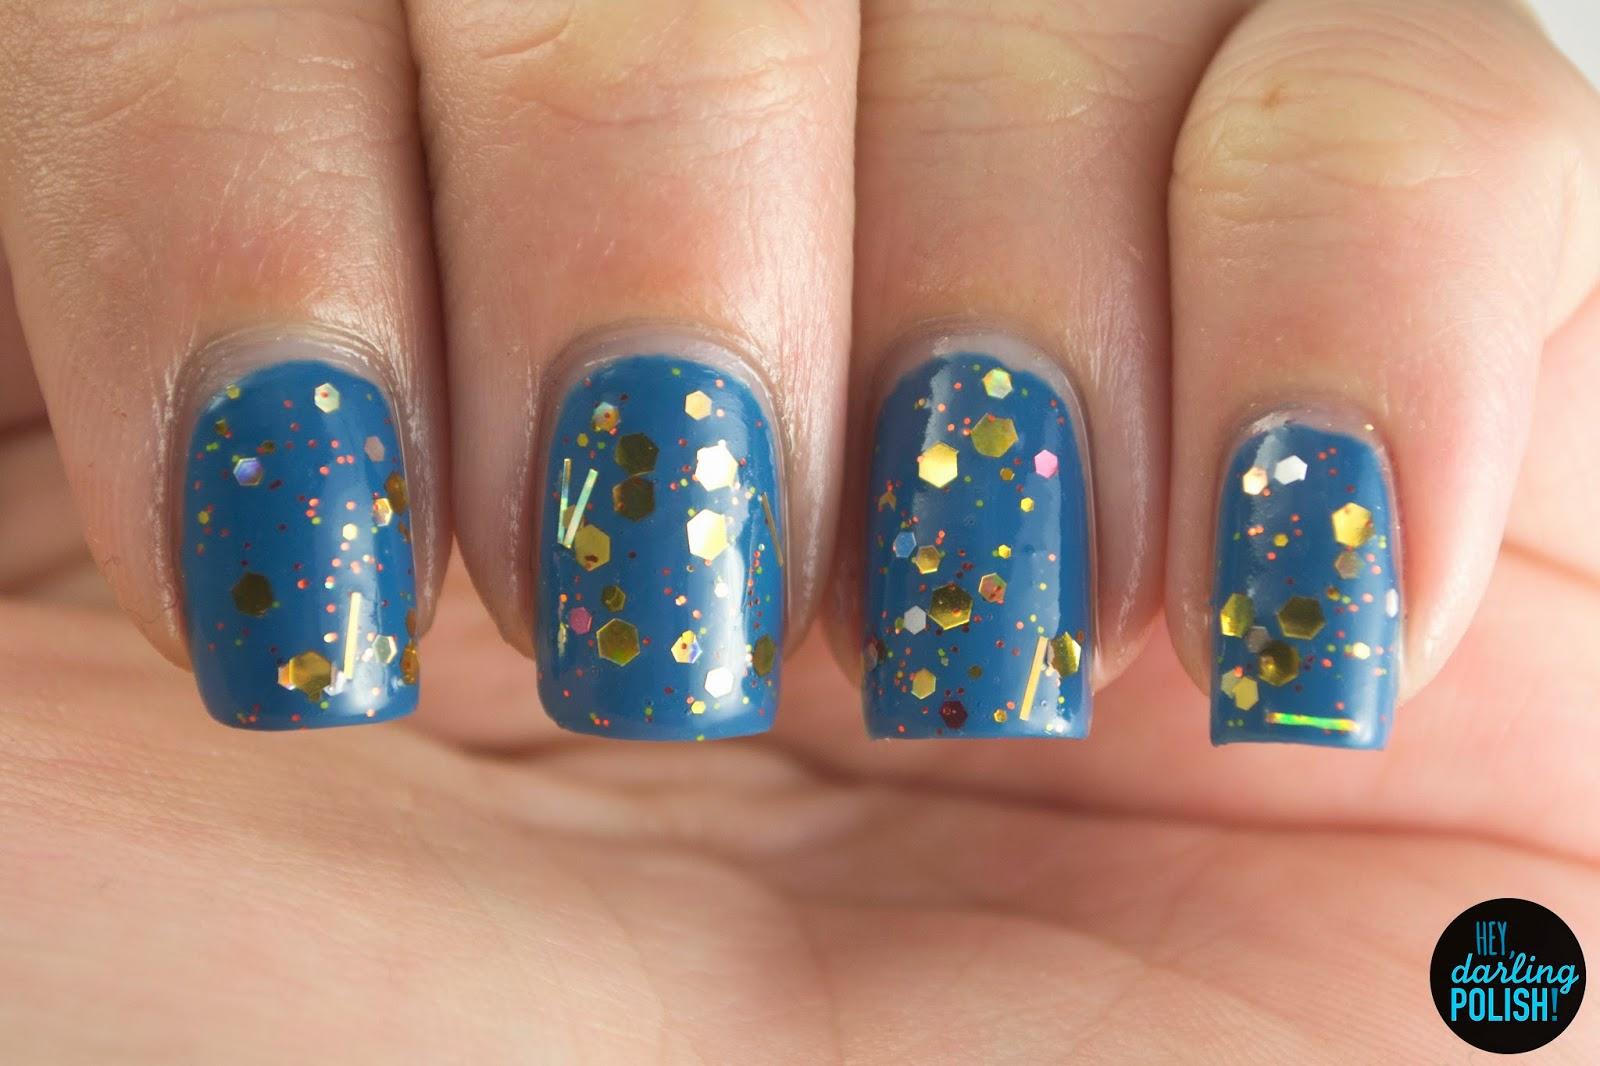 gold, sunburst, blue, nails, nail polish, polish, indie, indie polish, indie nail polish, glitter, swatch, hey darling polish, northern star polish